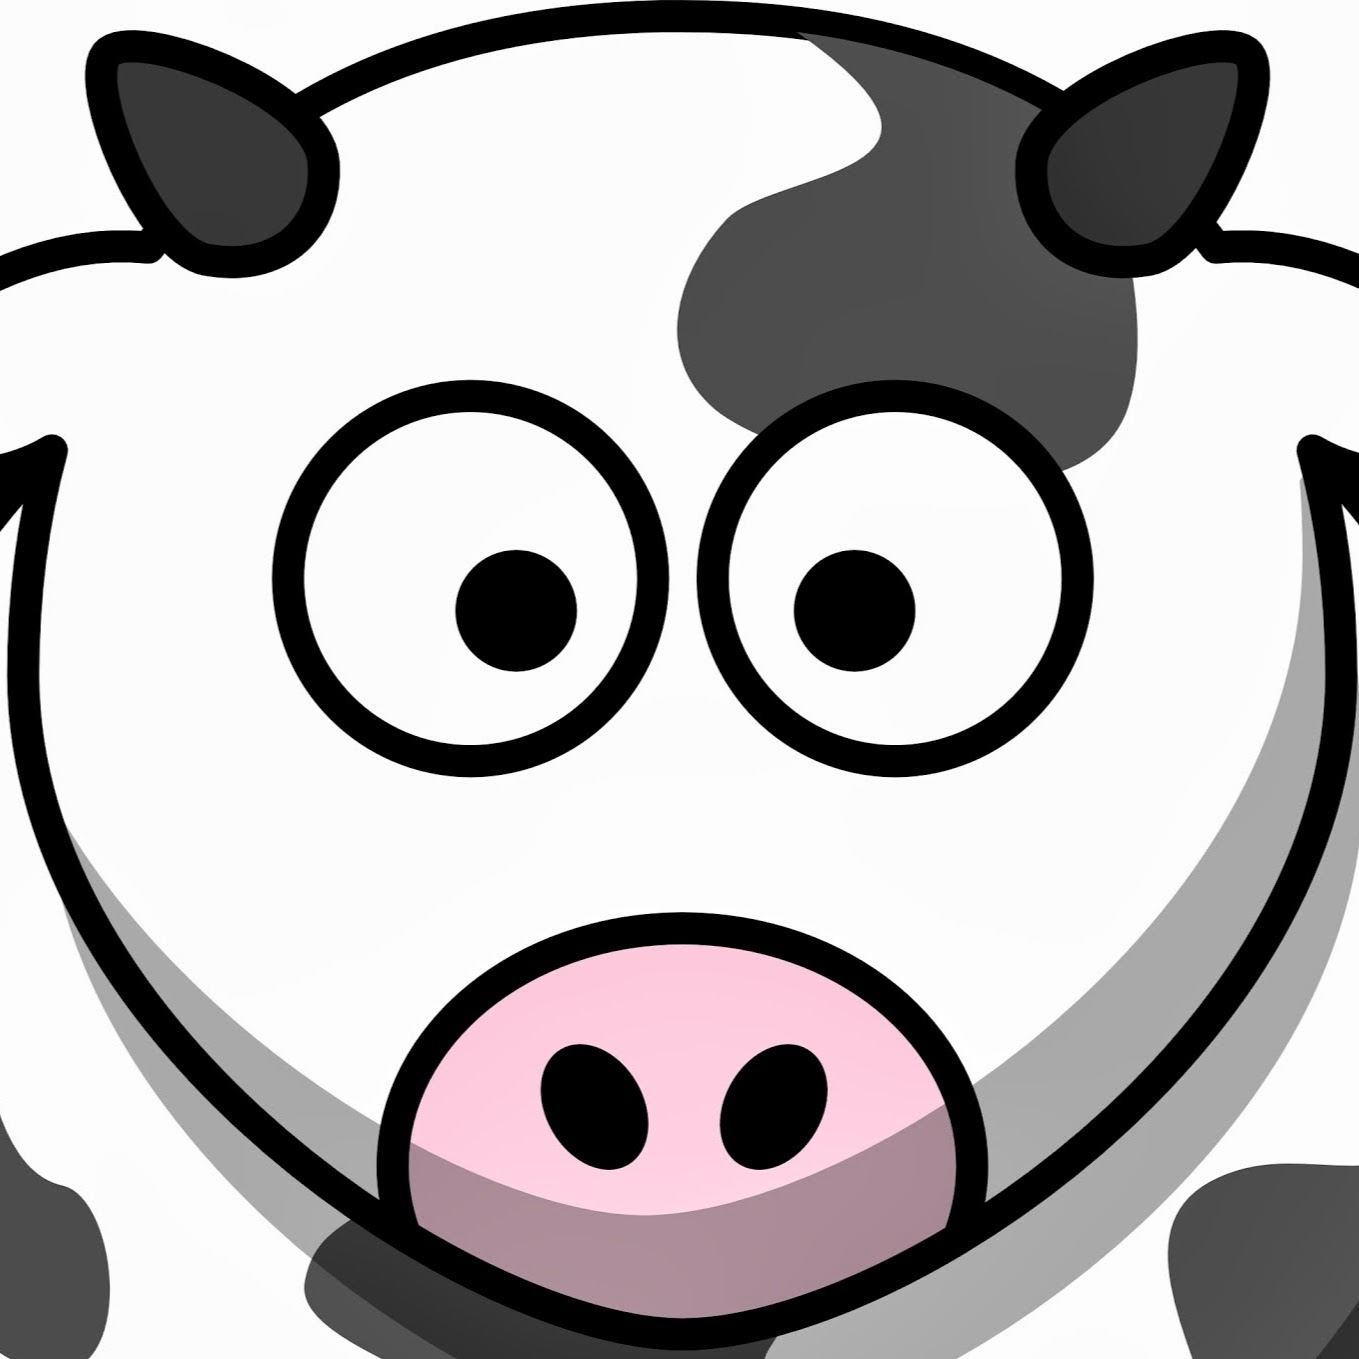 Cow Cartoon Clip Art - Cliparts.co